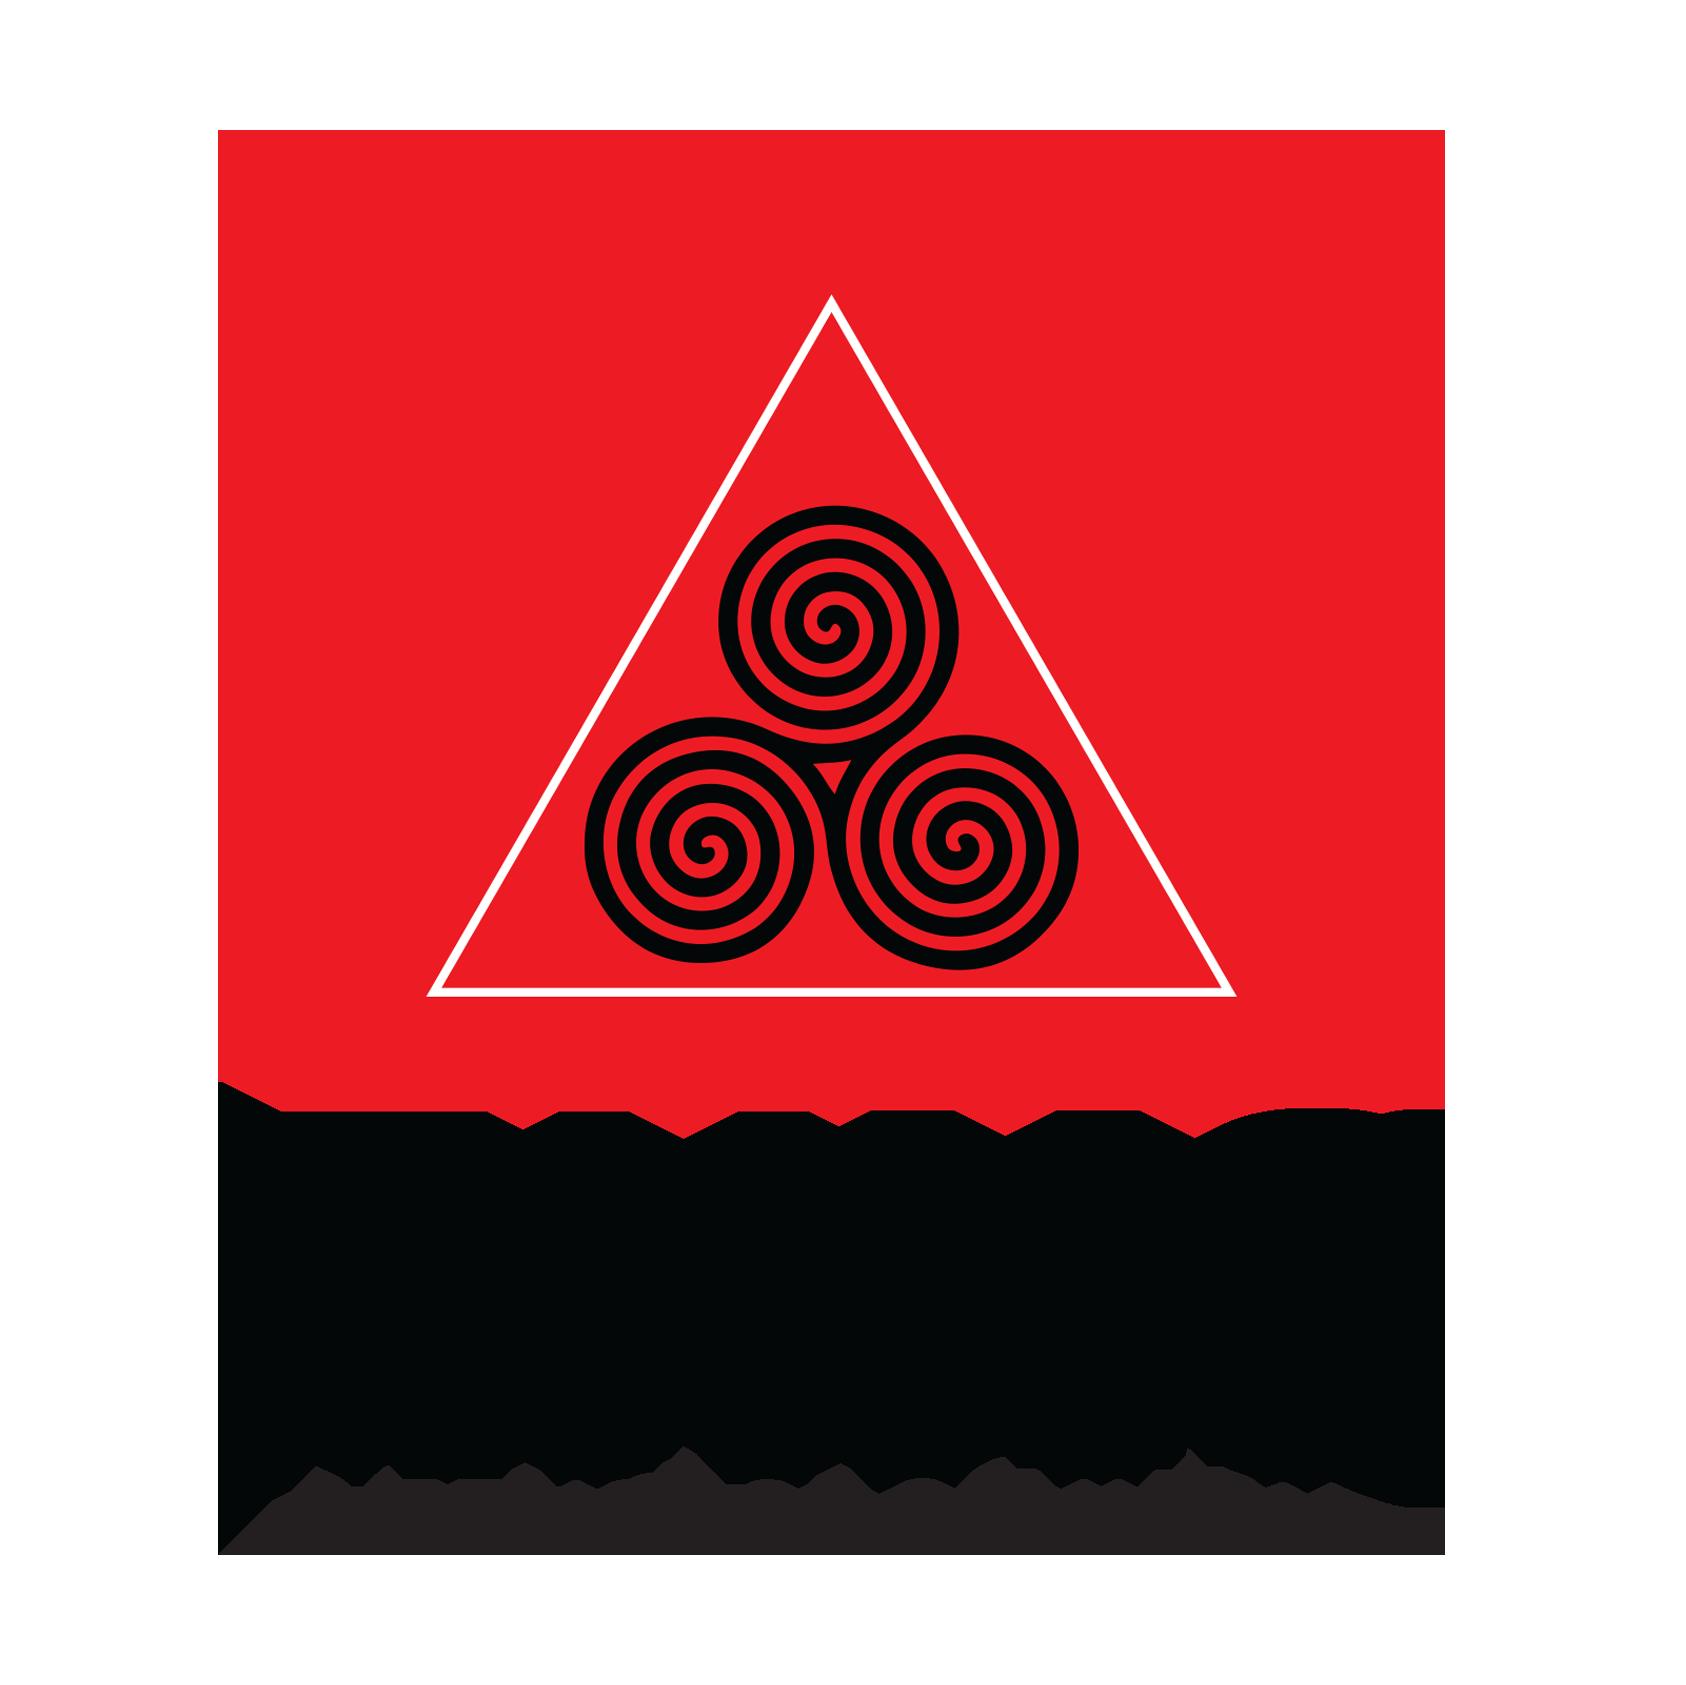 ANXO CIDER - WASHINGTON, D.C.